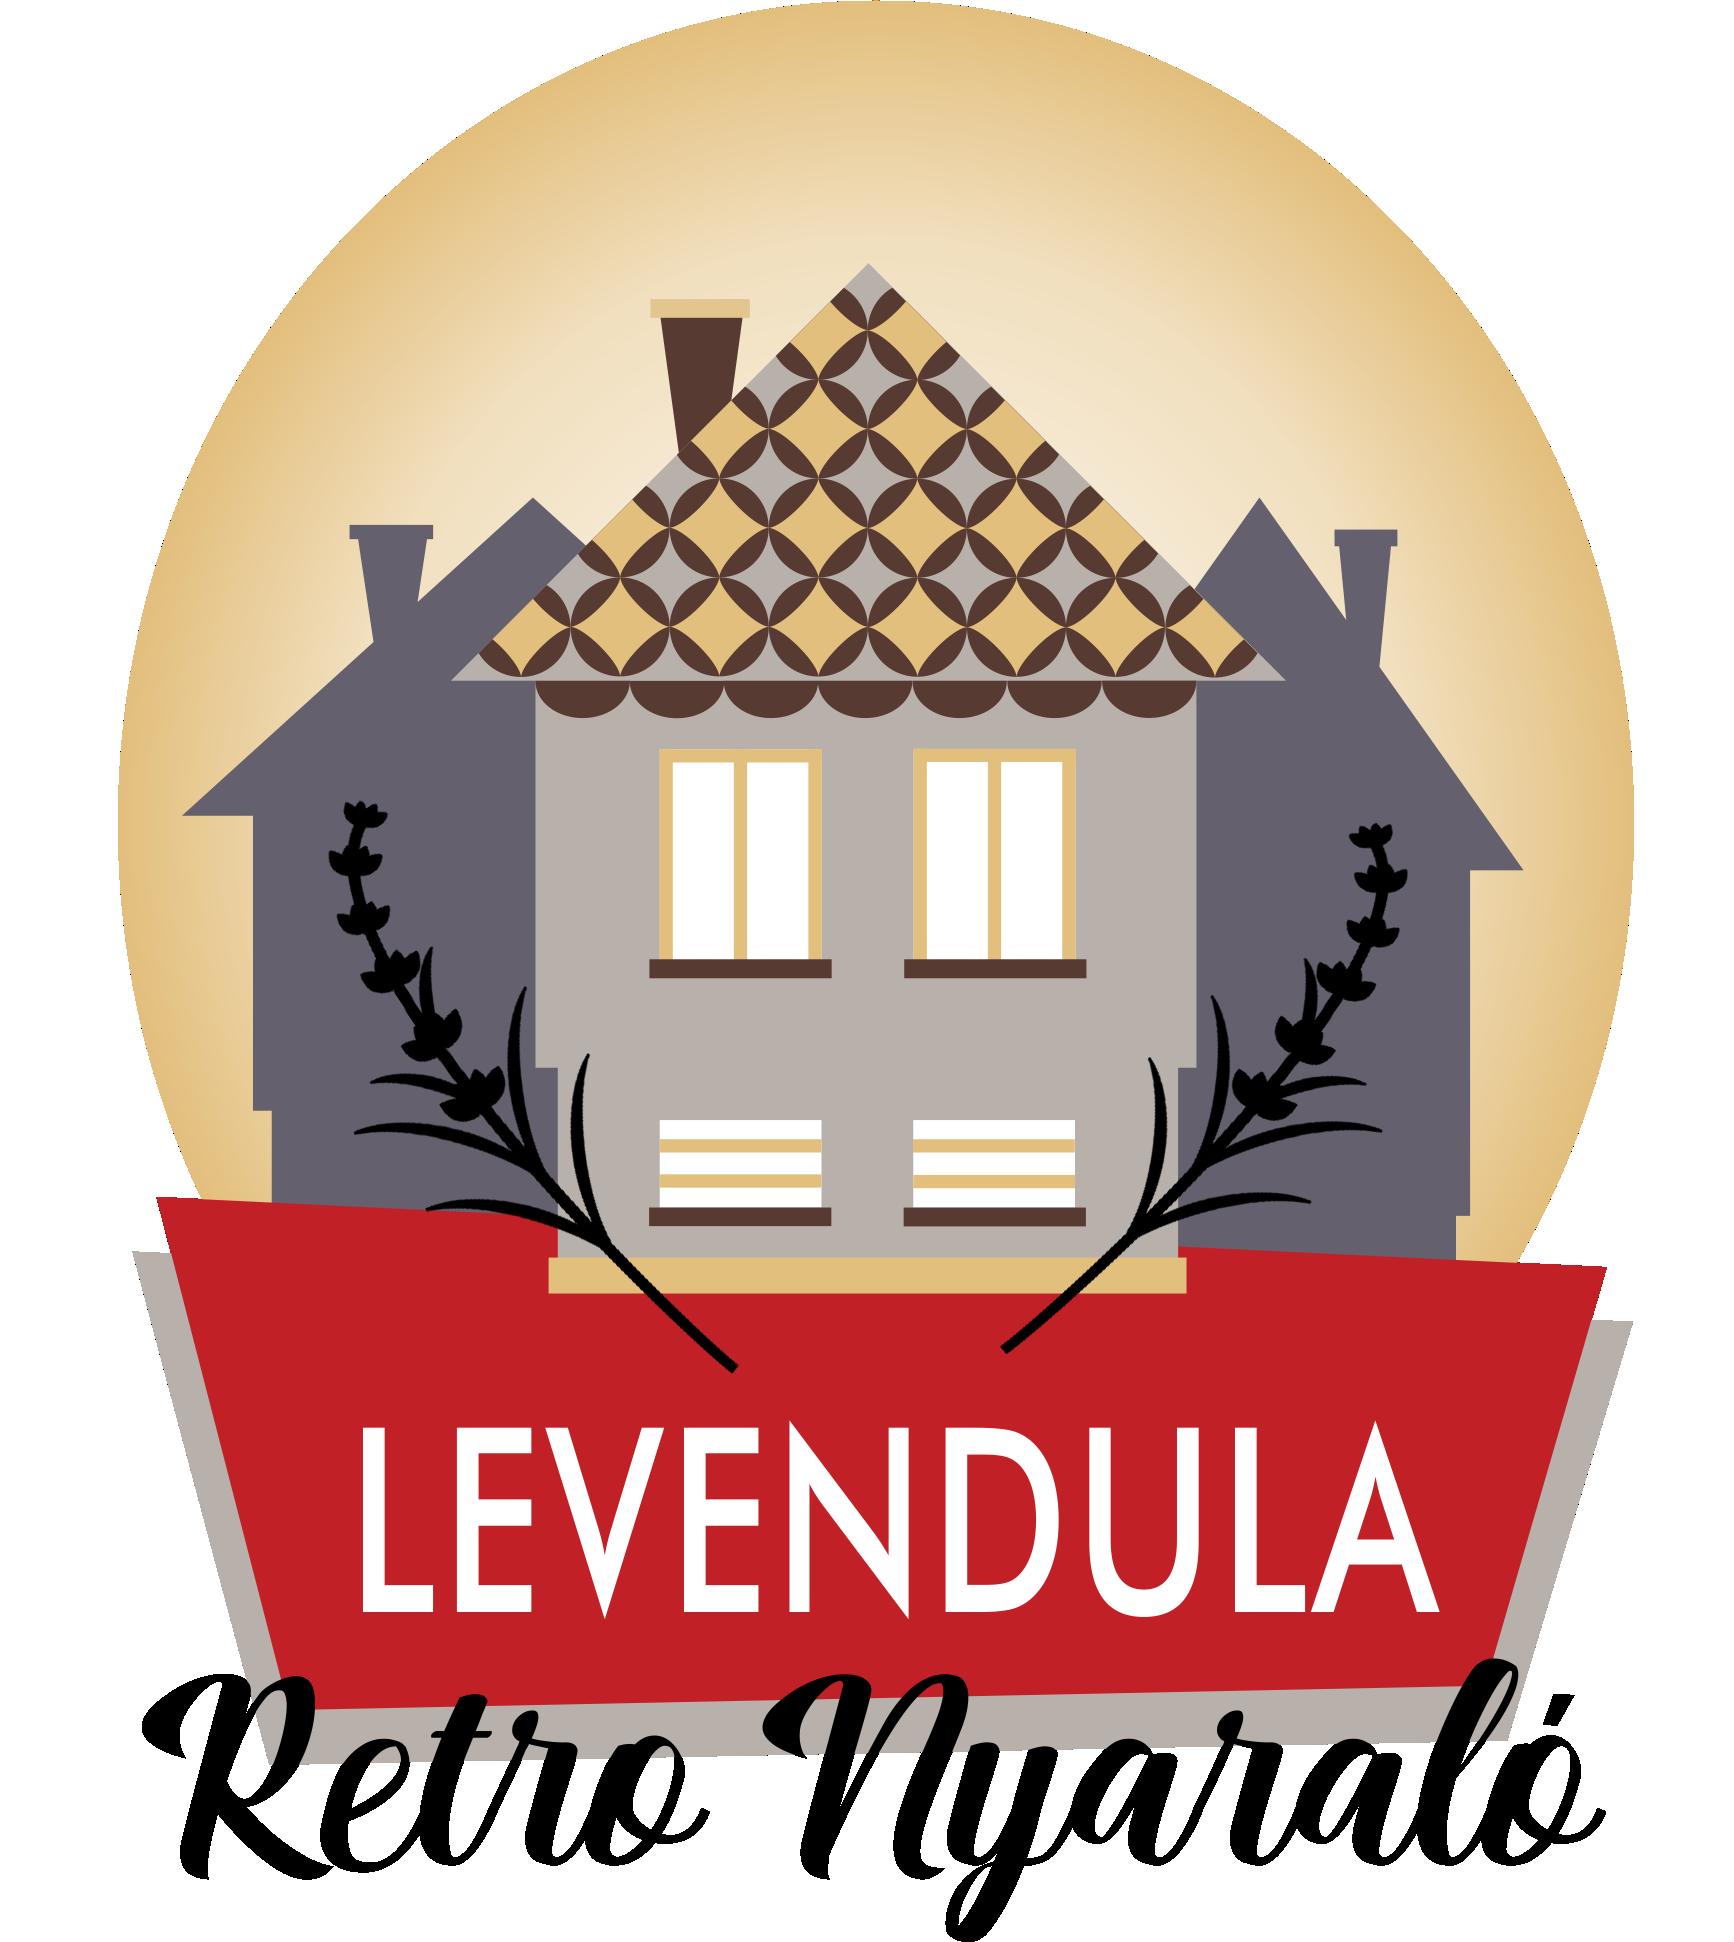 levendula_logo_hatteres_1.png